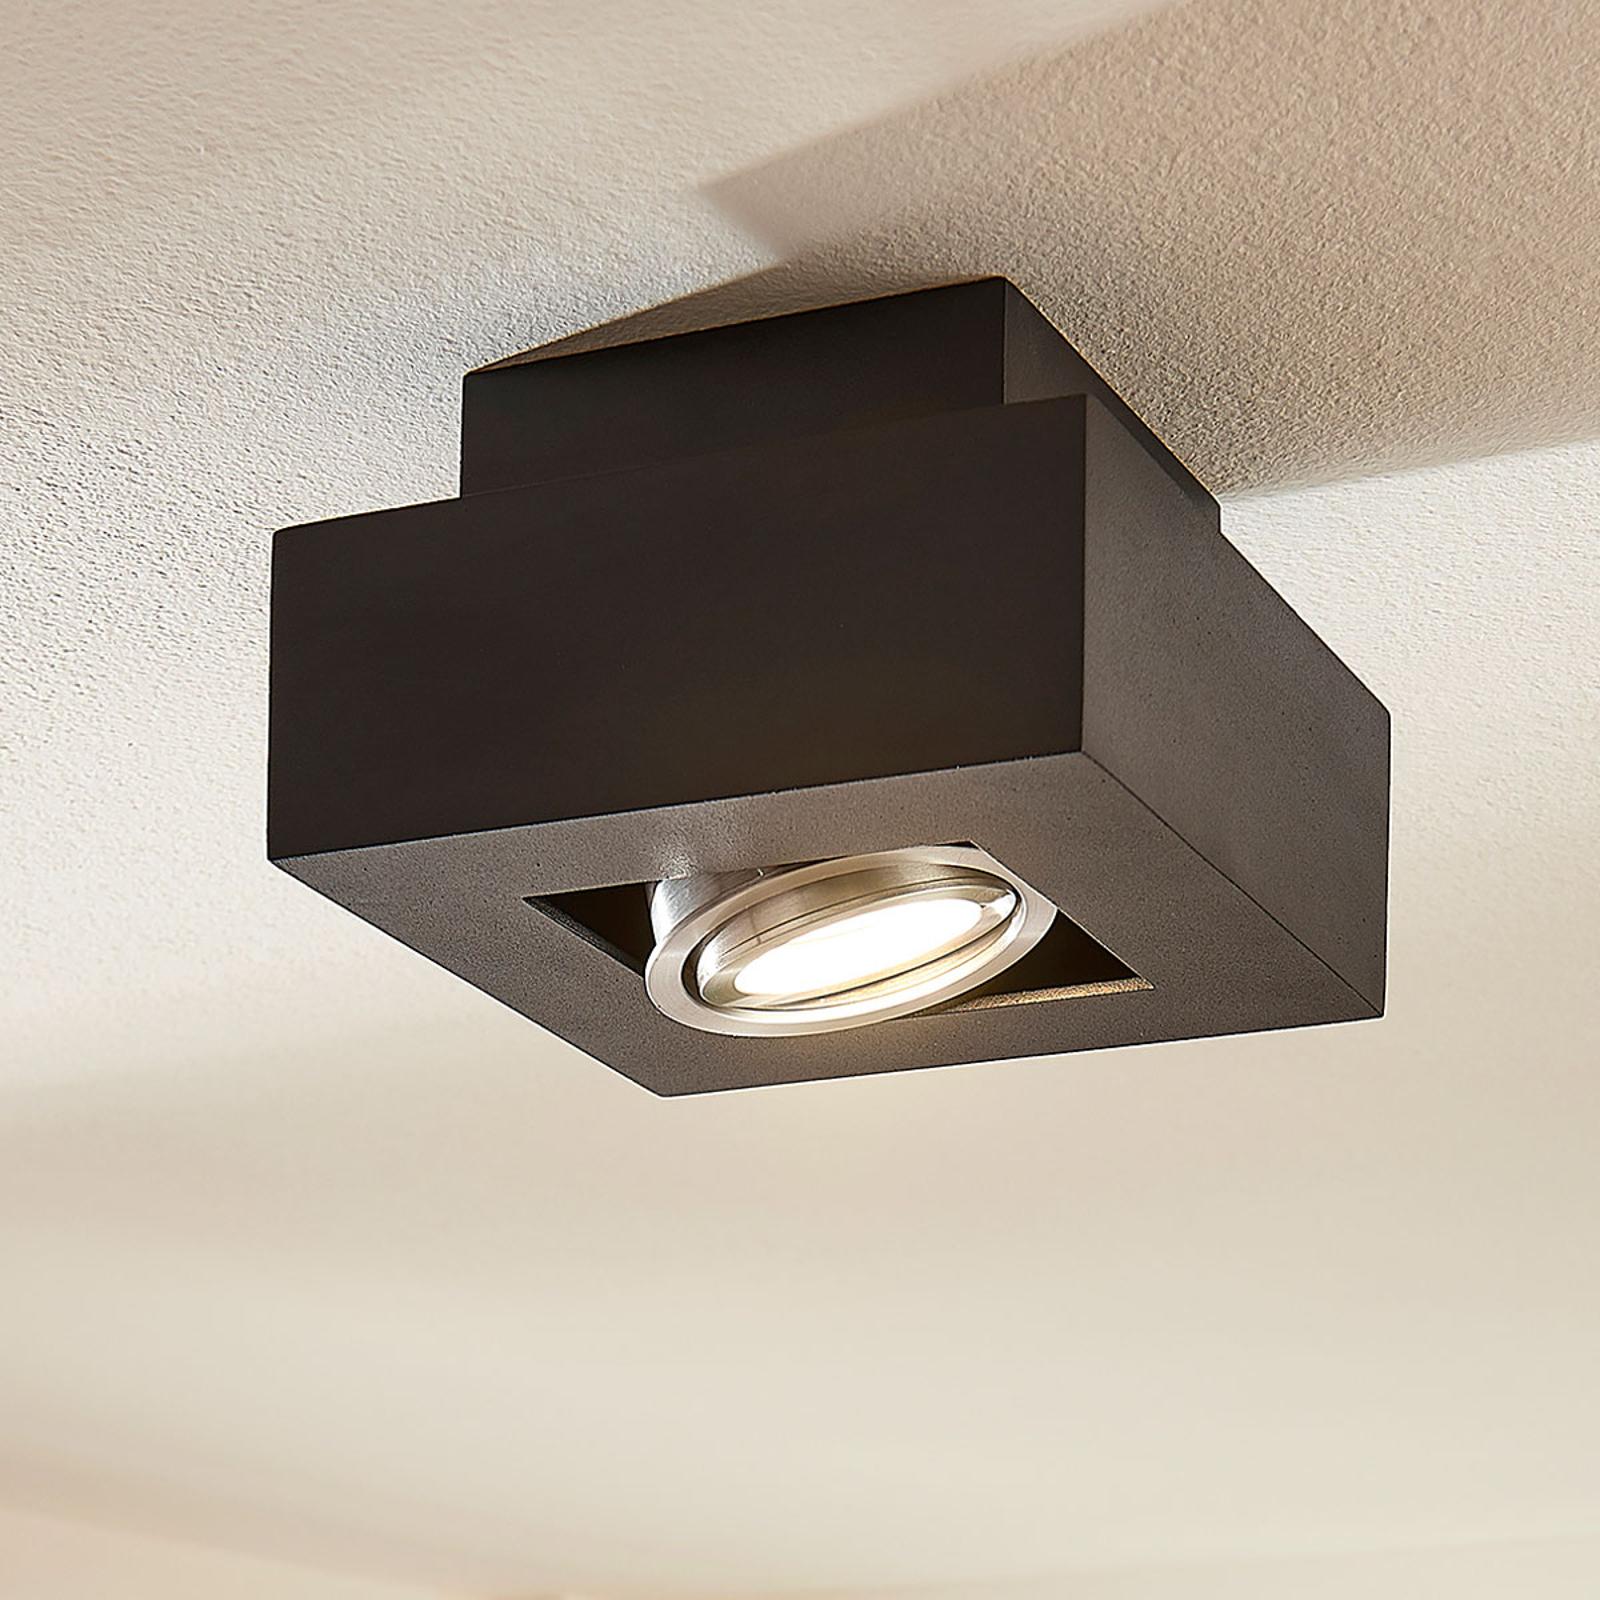 Lampa sufitowa LED Vince, 14x14cm czarna